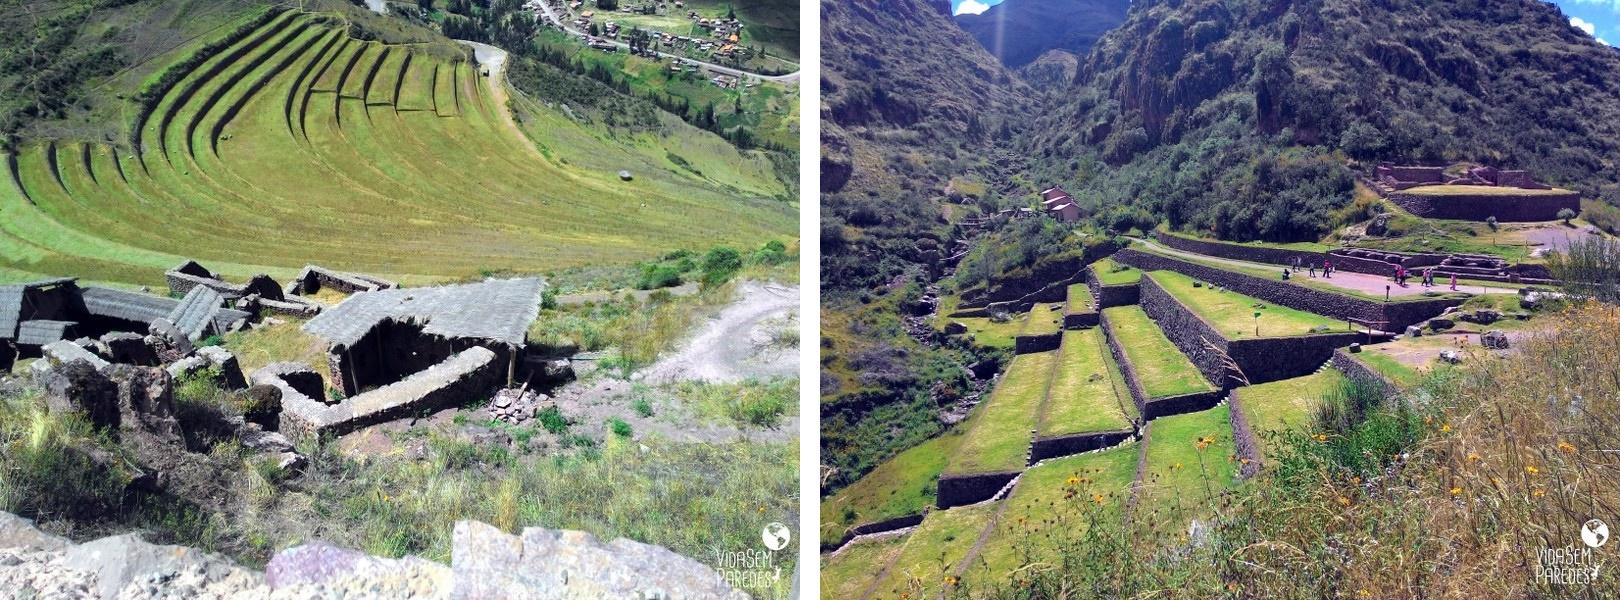 Vida sem Paredes - Valle Sagrado dos incas (8)